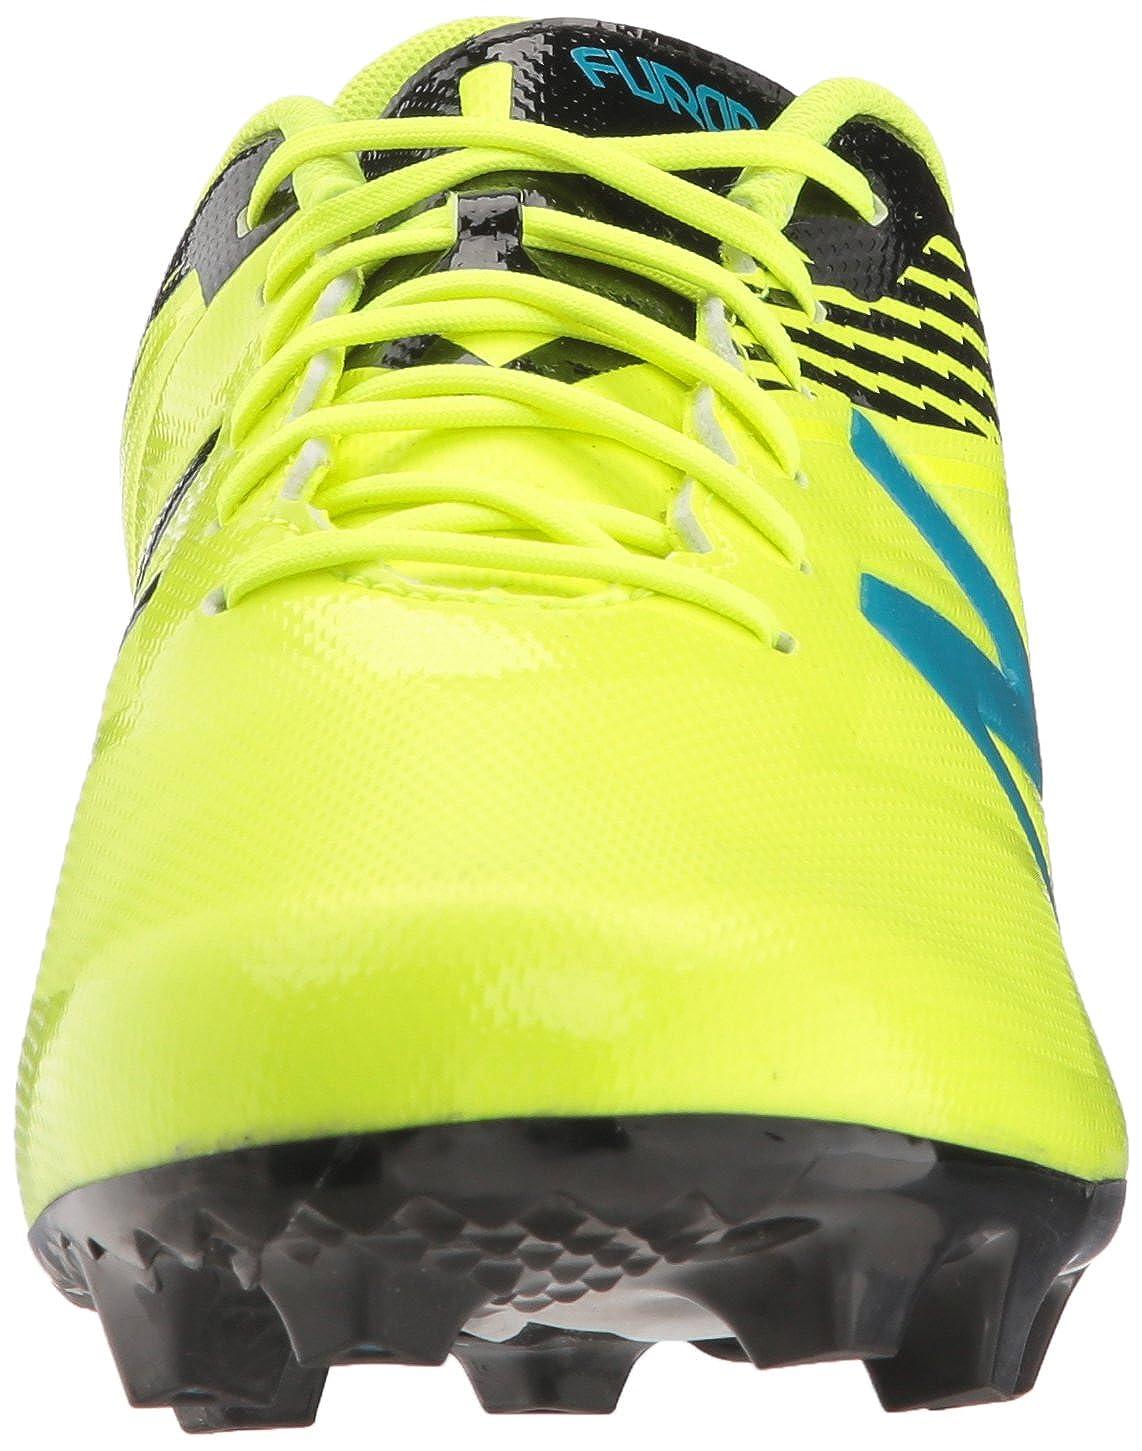 9752f36db8807 Amazon.com | New Balance Men's Furon 3.0 Dispatch FG Soccer Shoe | Soccer